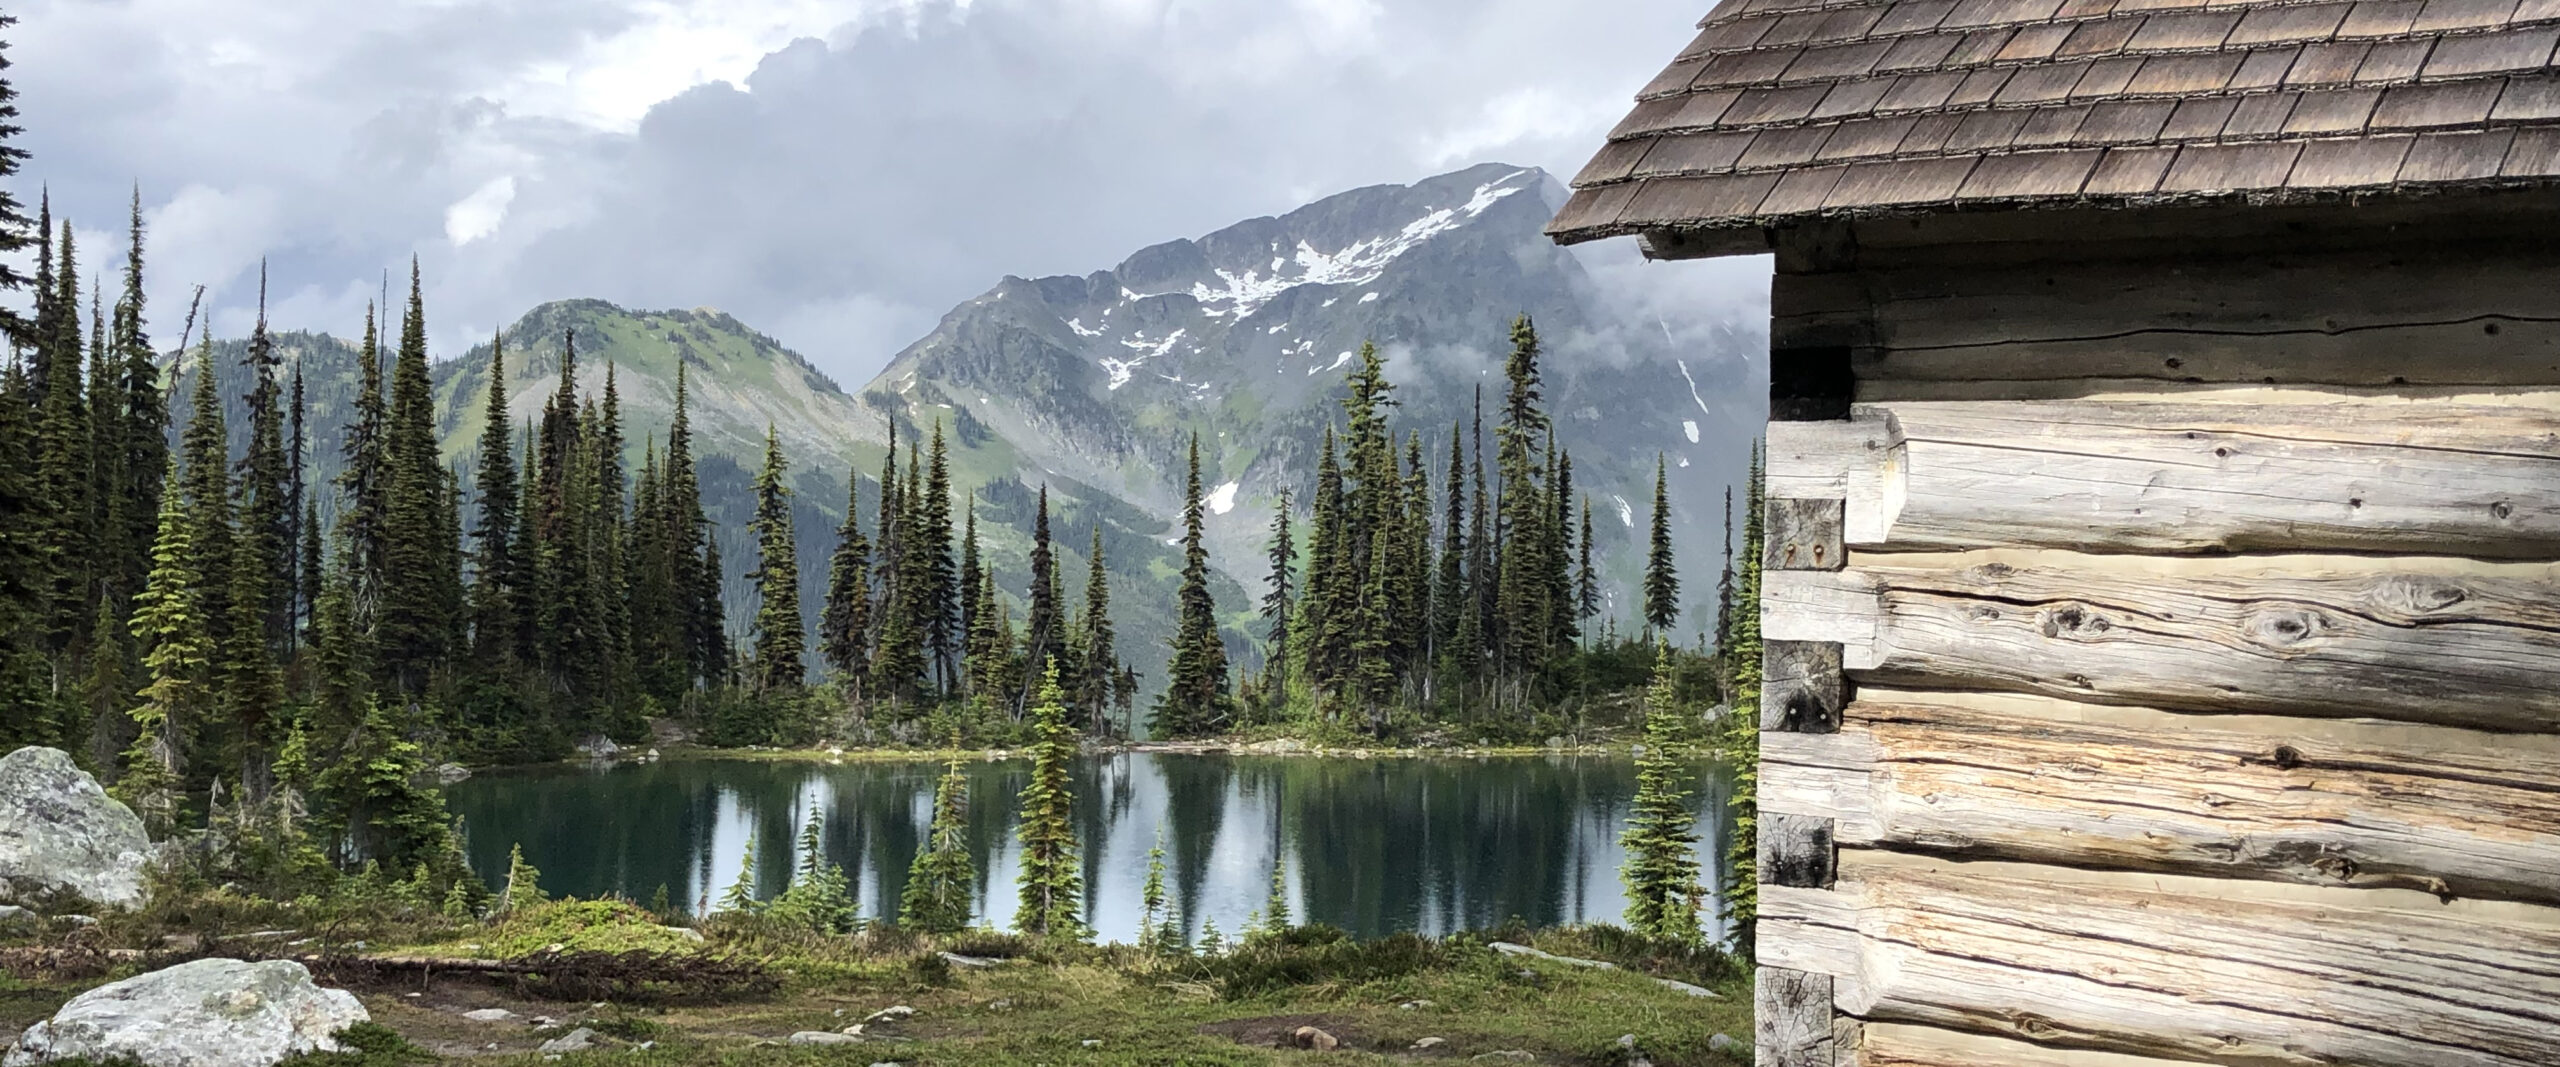 Duurzaam reizen in West-Canada: berghutten in de nationale parken